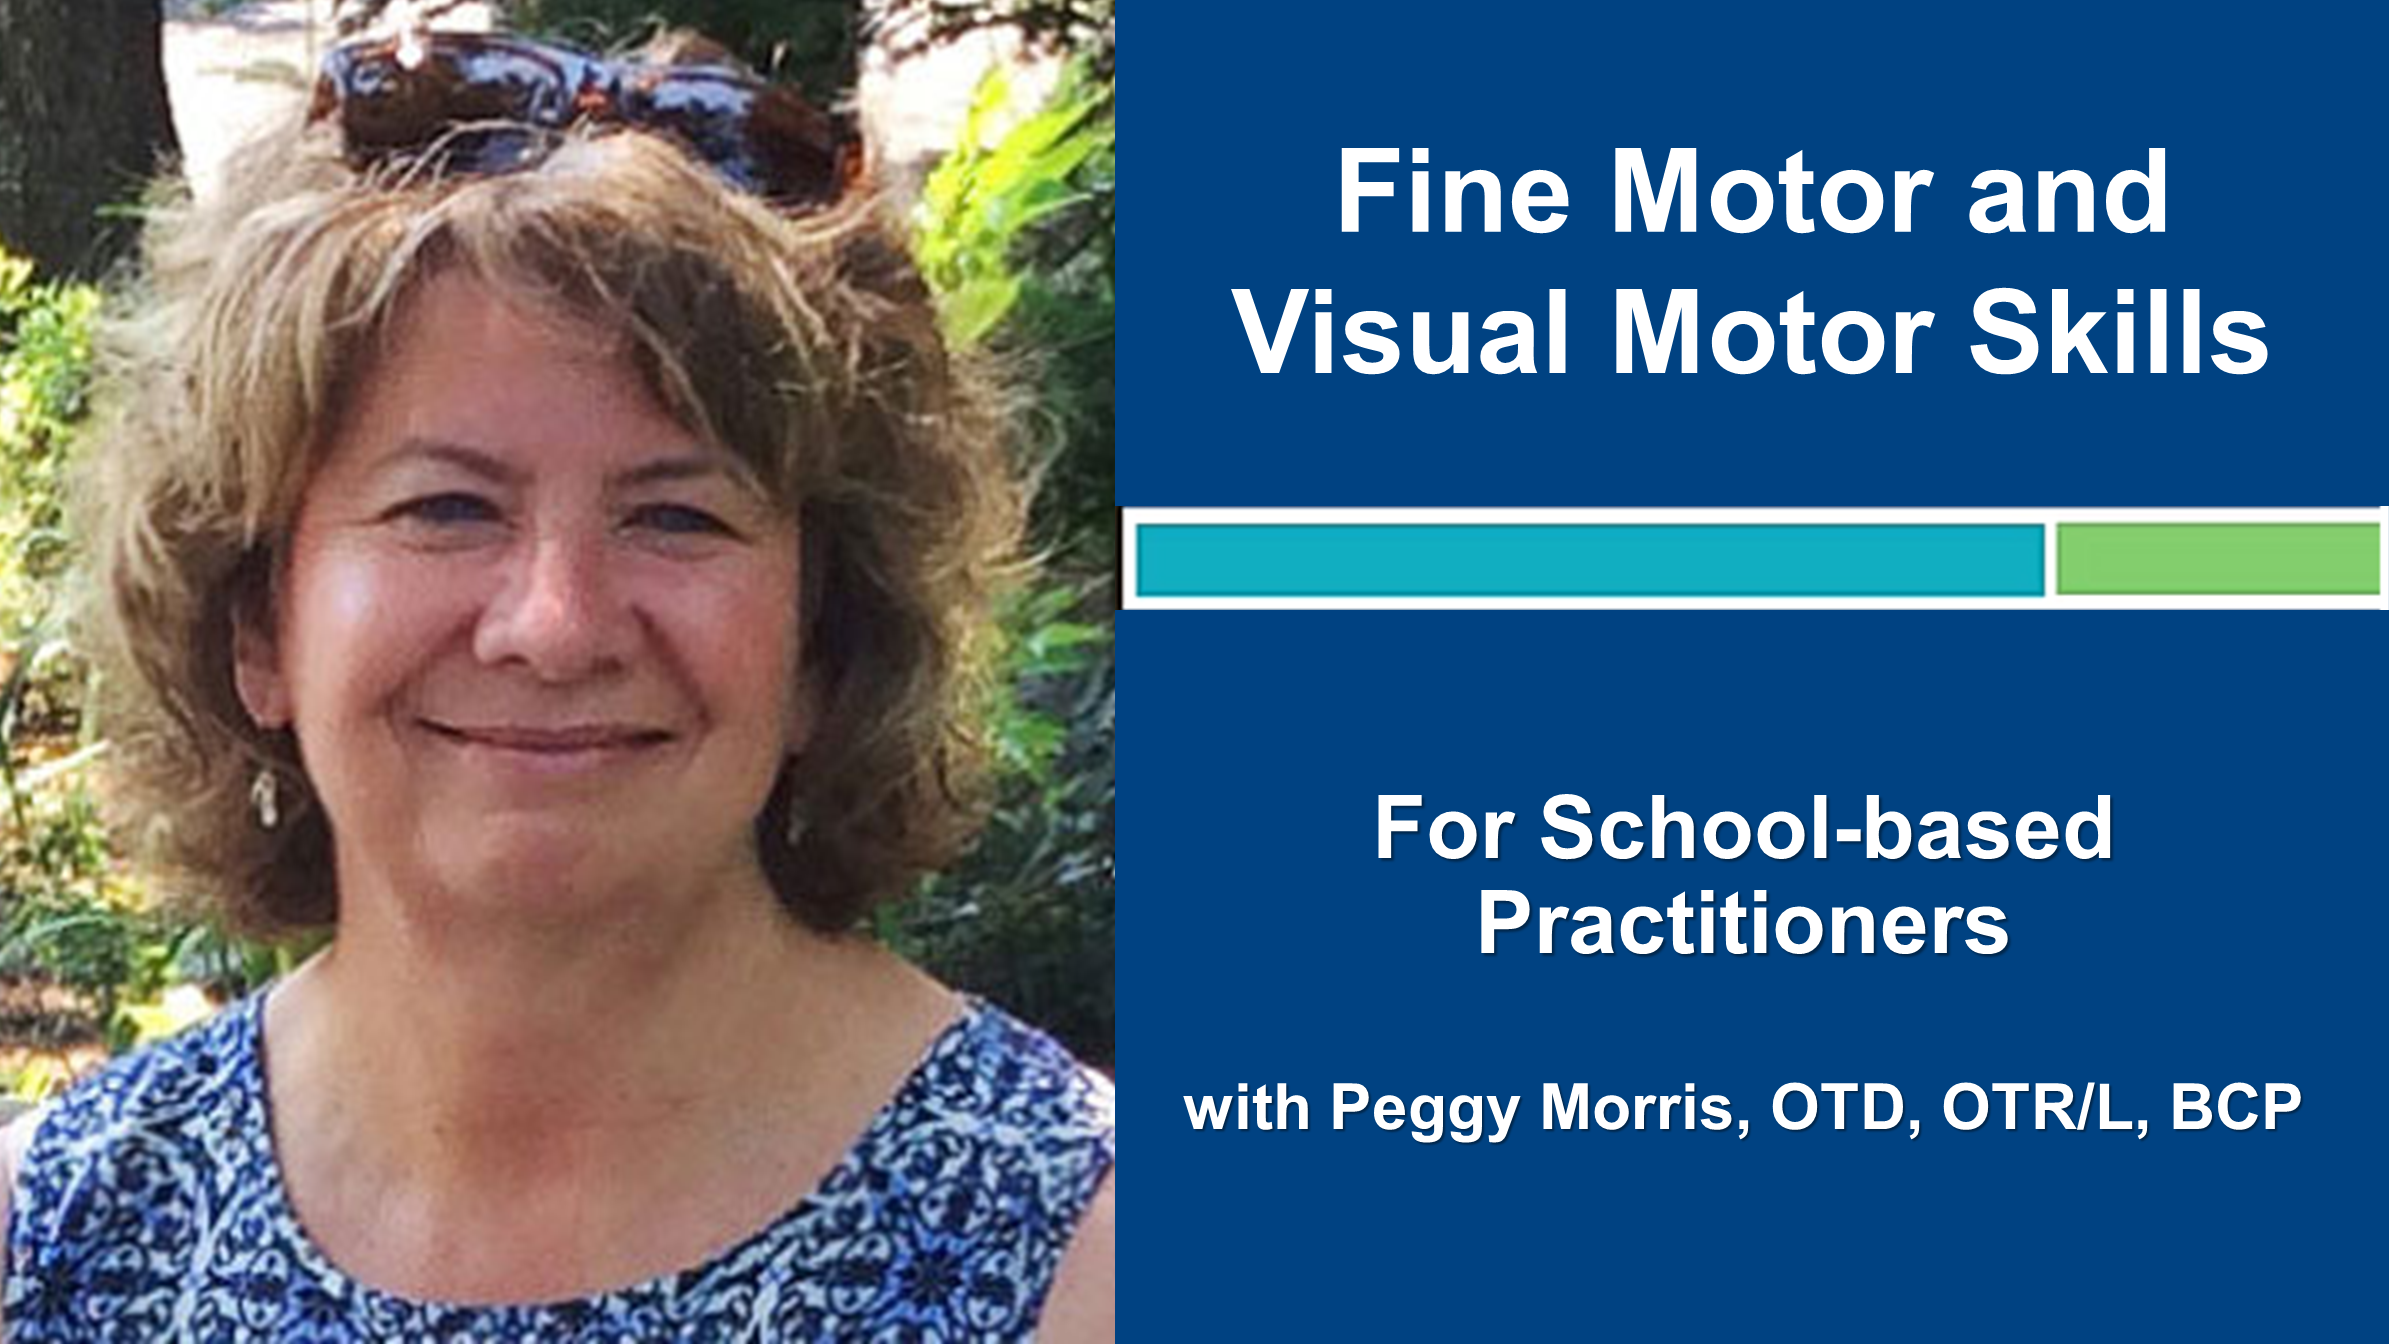 Webinar 7: Fine Motor and Visual Motor Skills with Peggy Morris, OTD, OTR/L, BCP